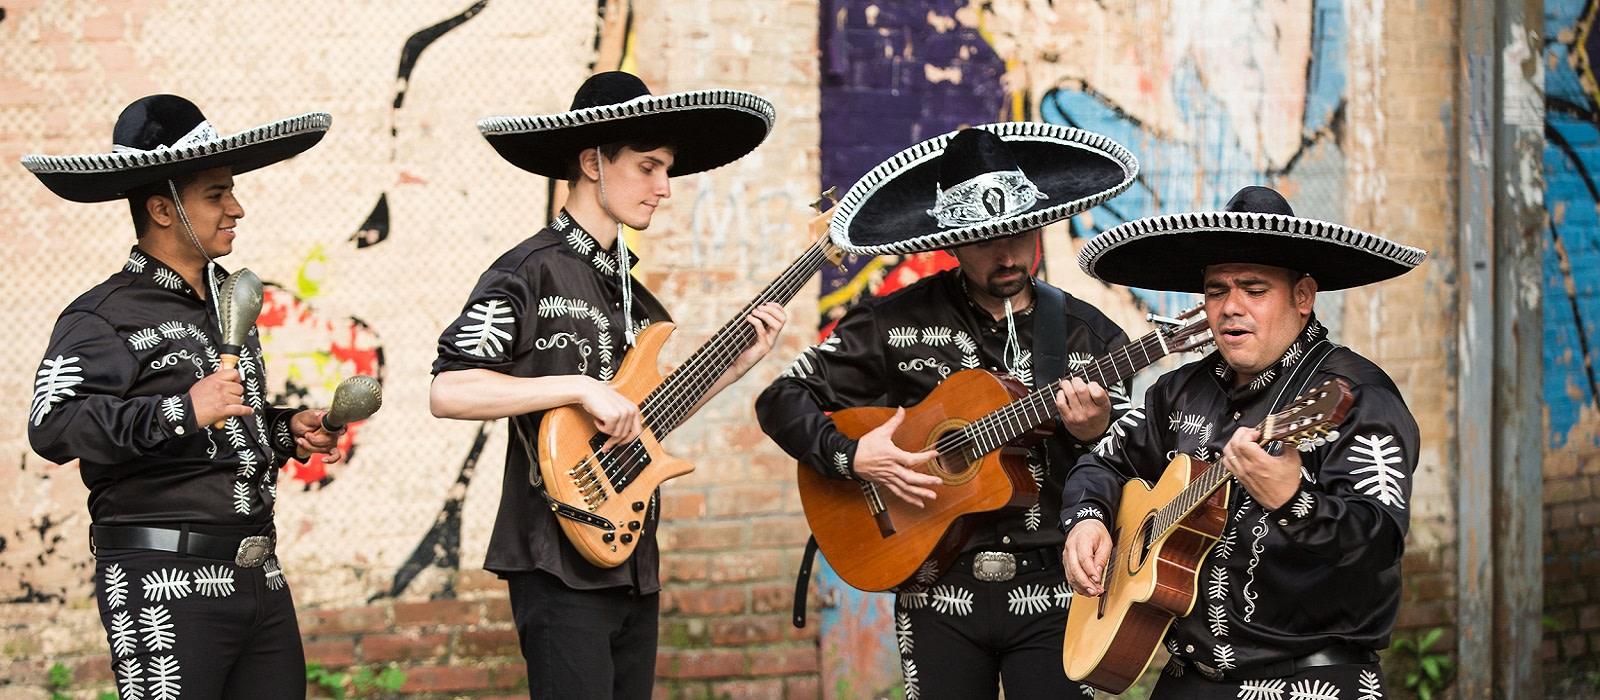 Mexican Culture - Mariachi band